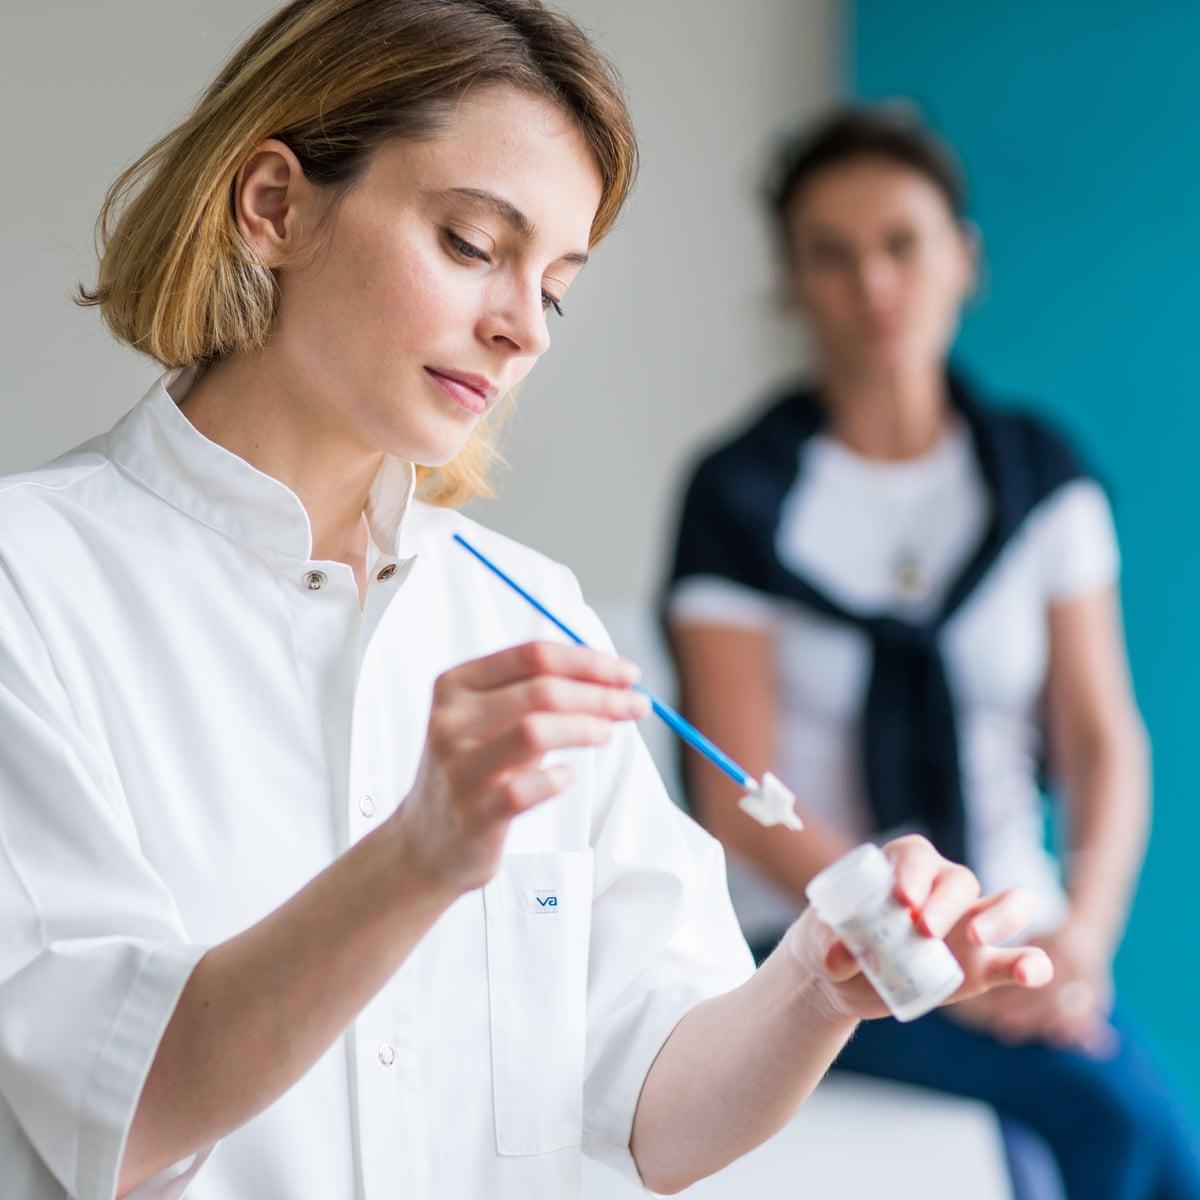 hpv virus treatment uk warts on old skin